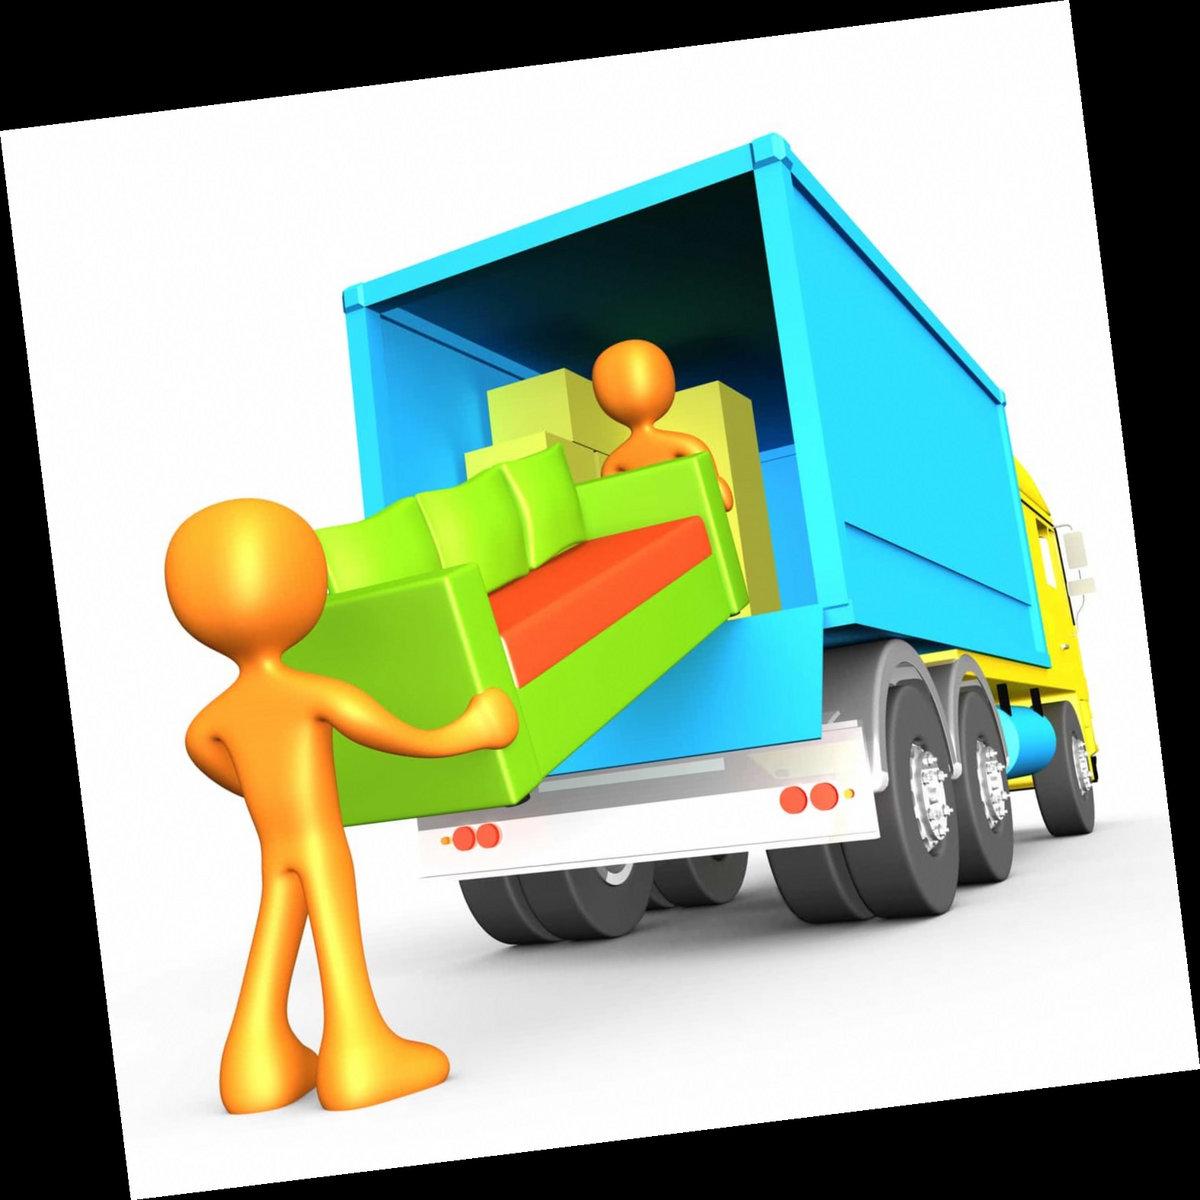 management information system moving business forward pdf